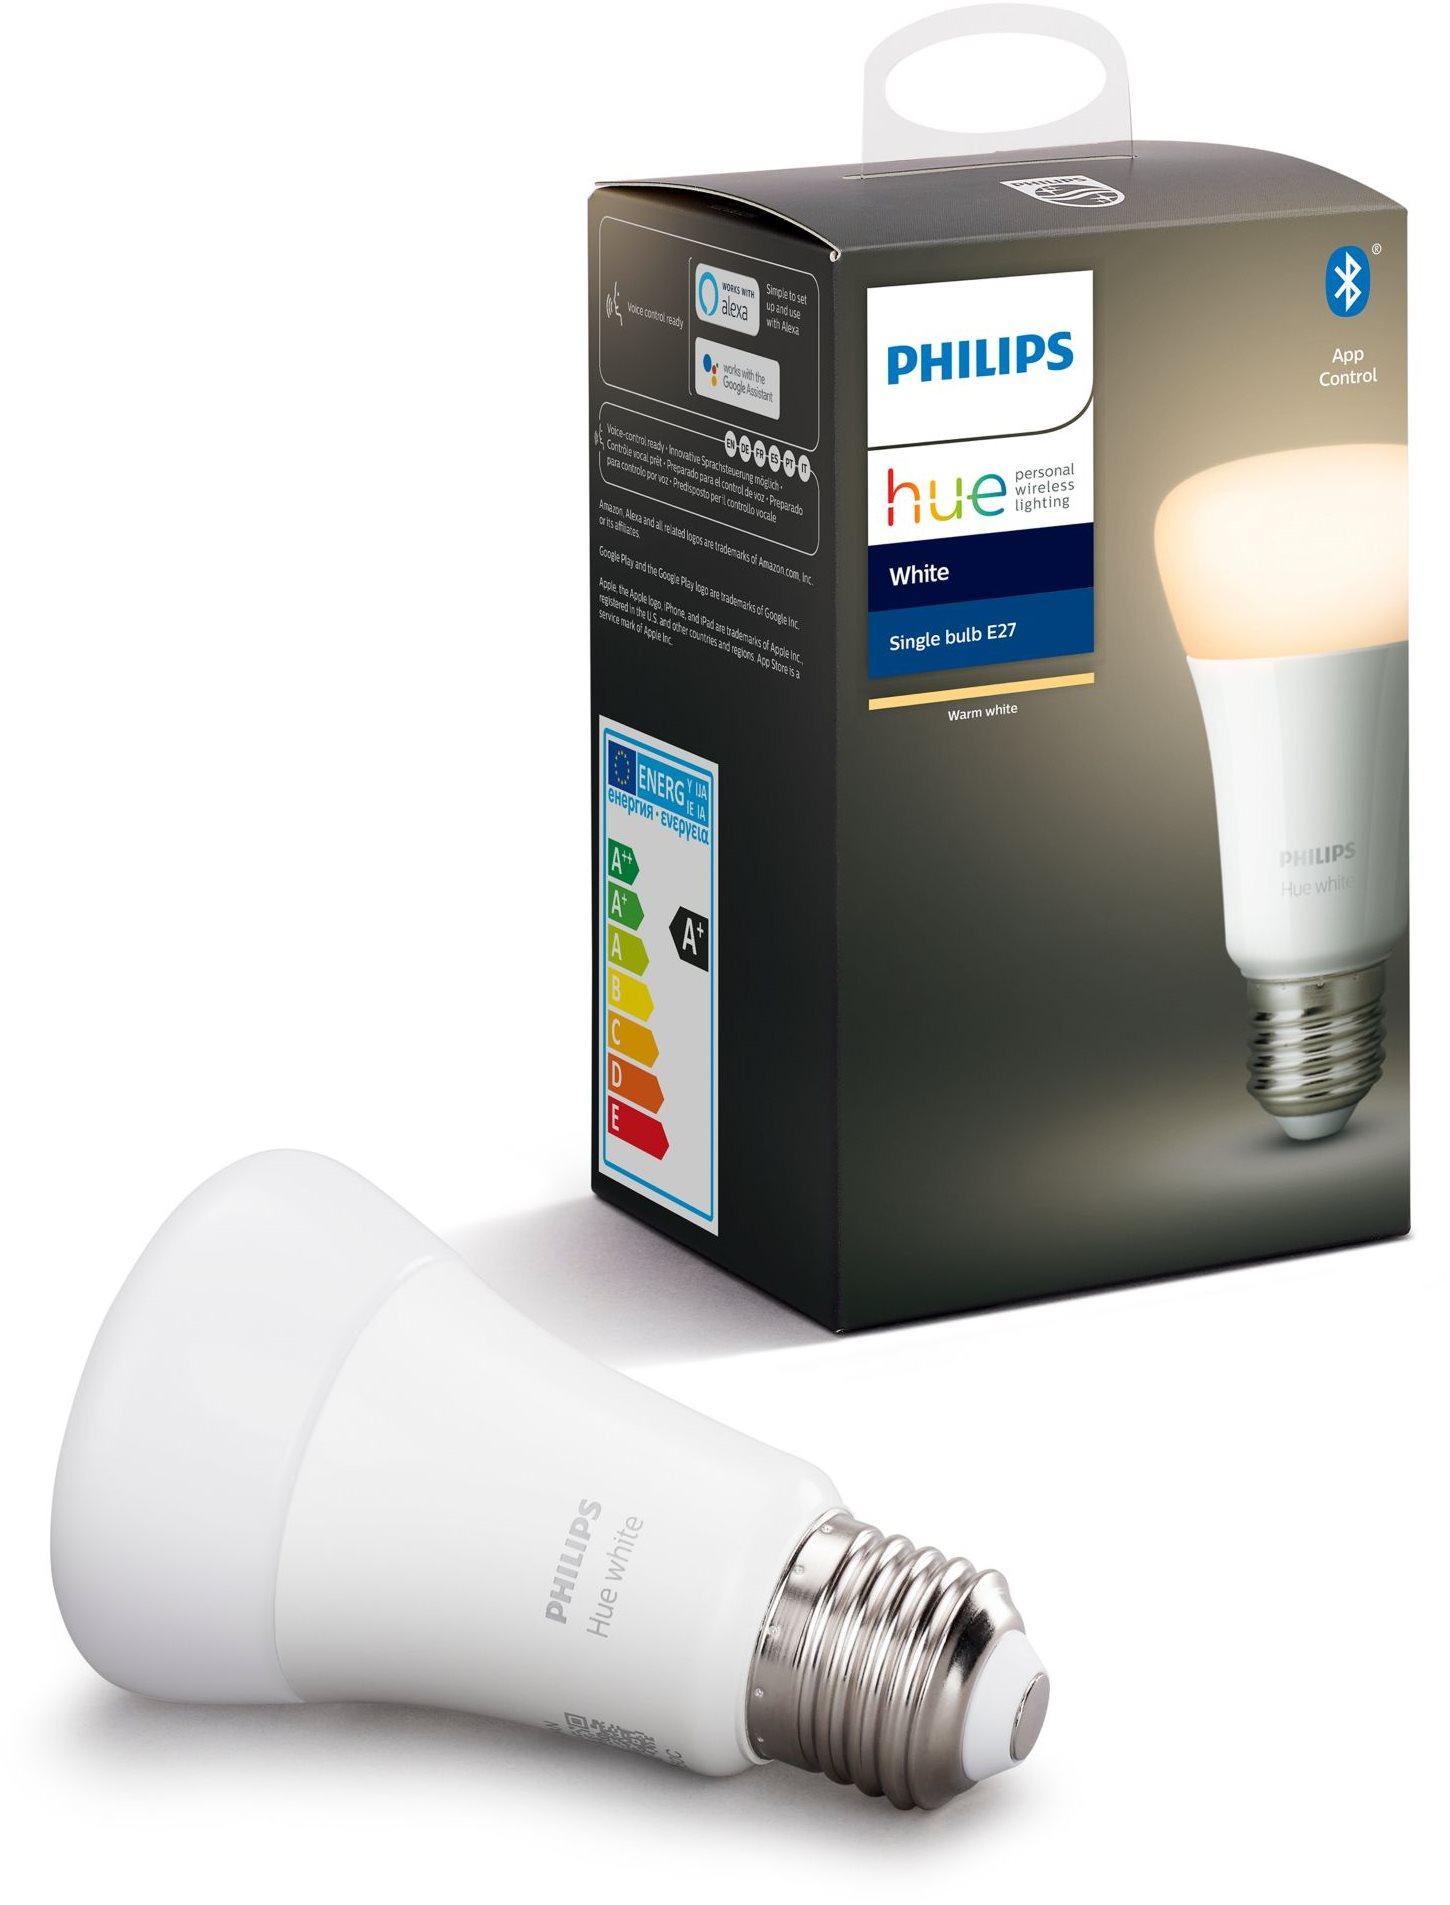 Philips Hue White 9W E27